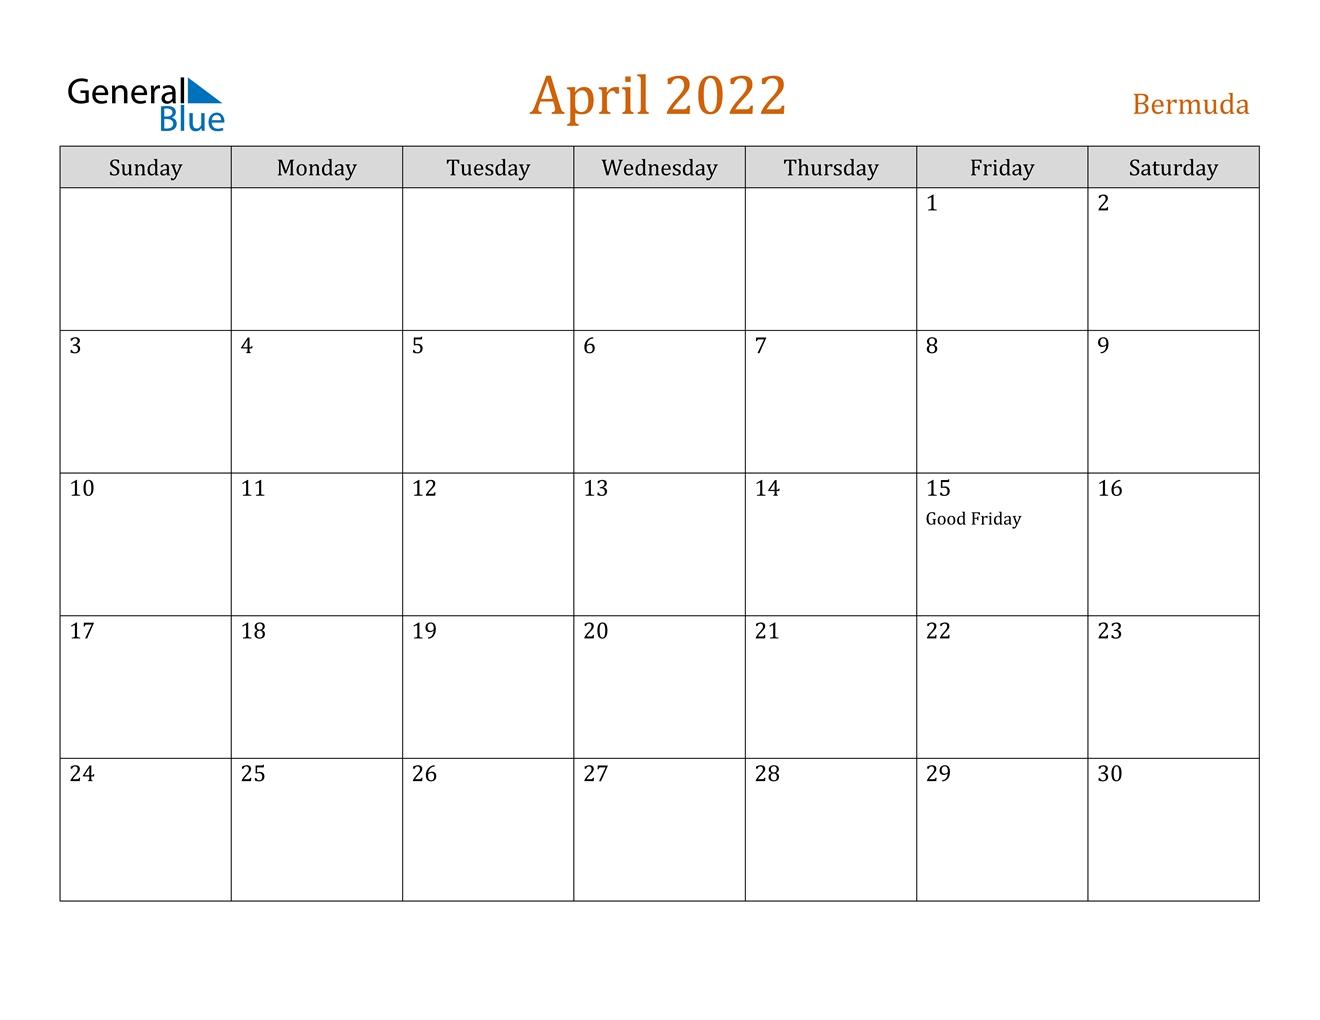 April 2022 Calendar - Bermuda